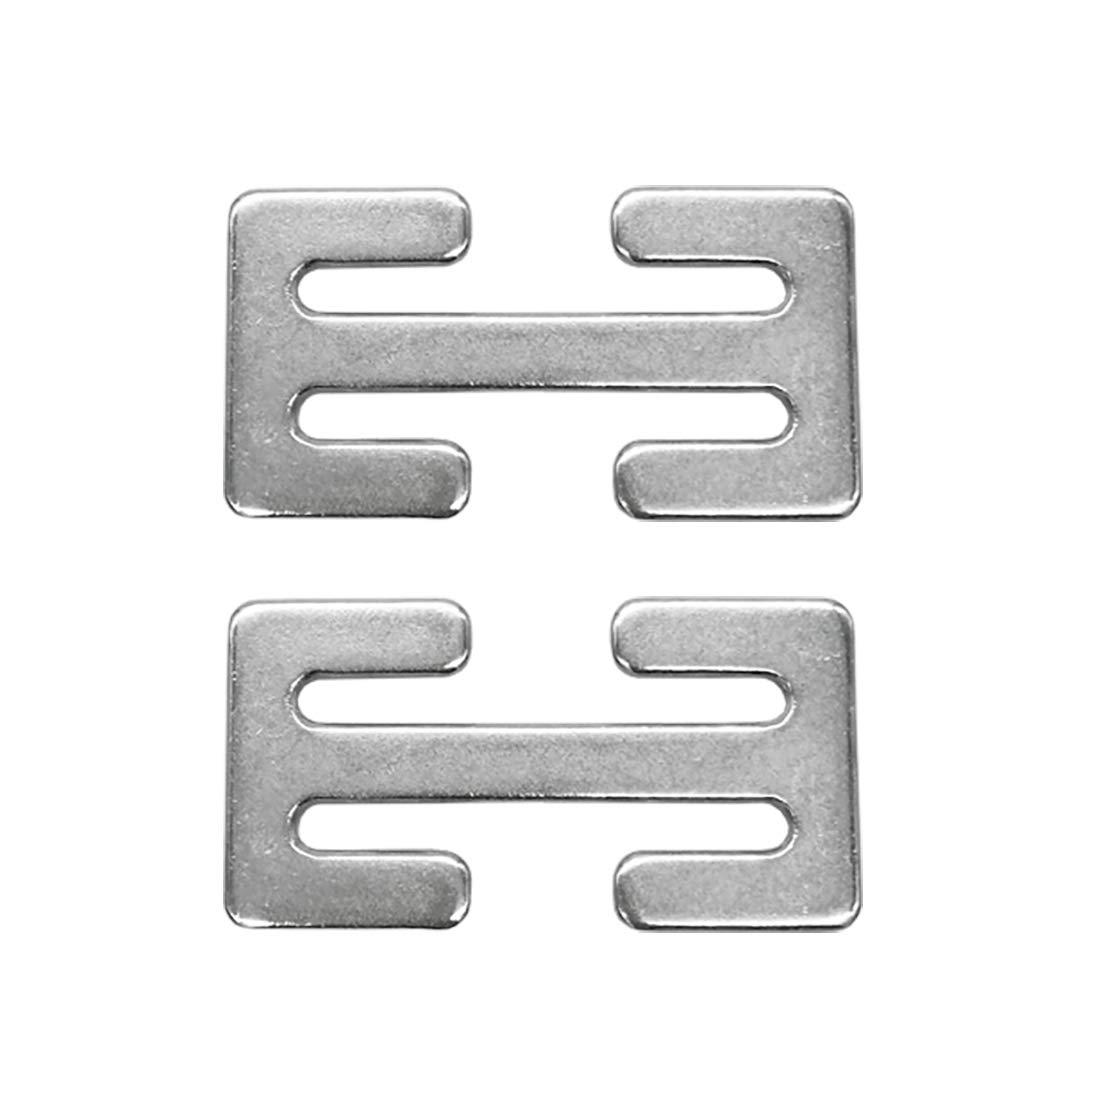 Sungrace Metal Lock(Silver, 2 Pack)